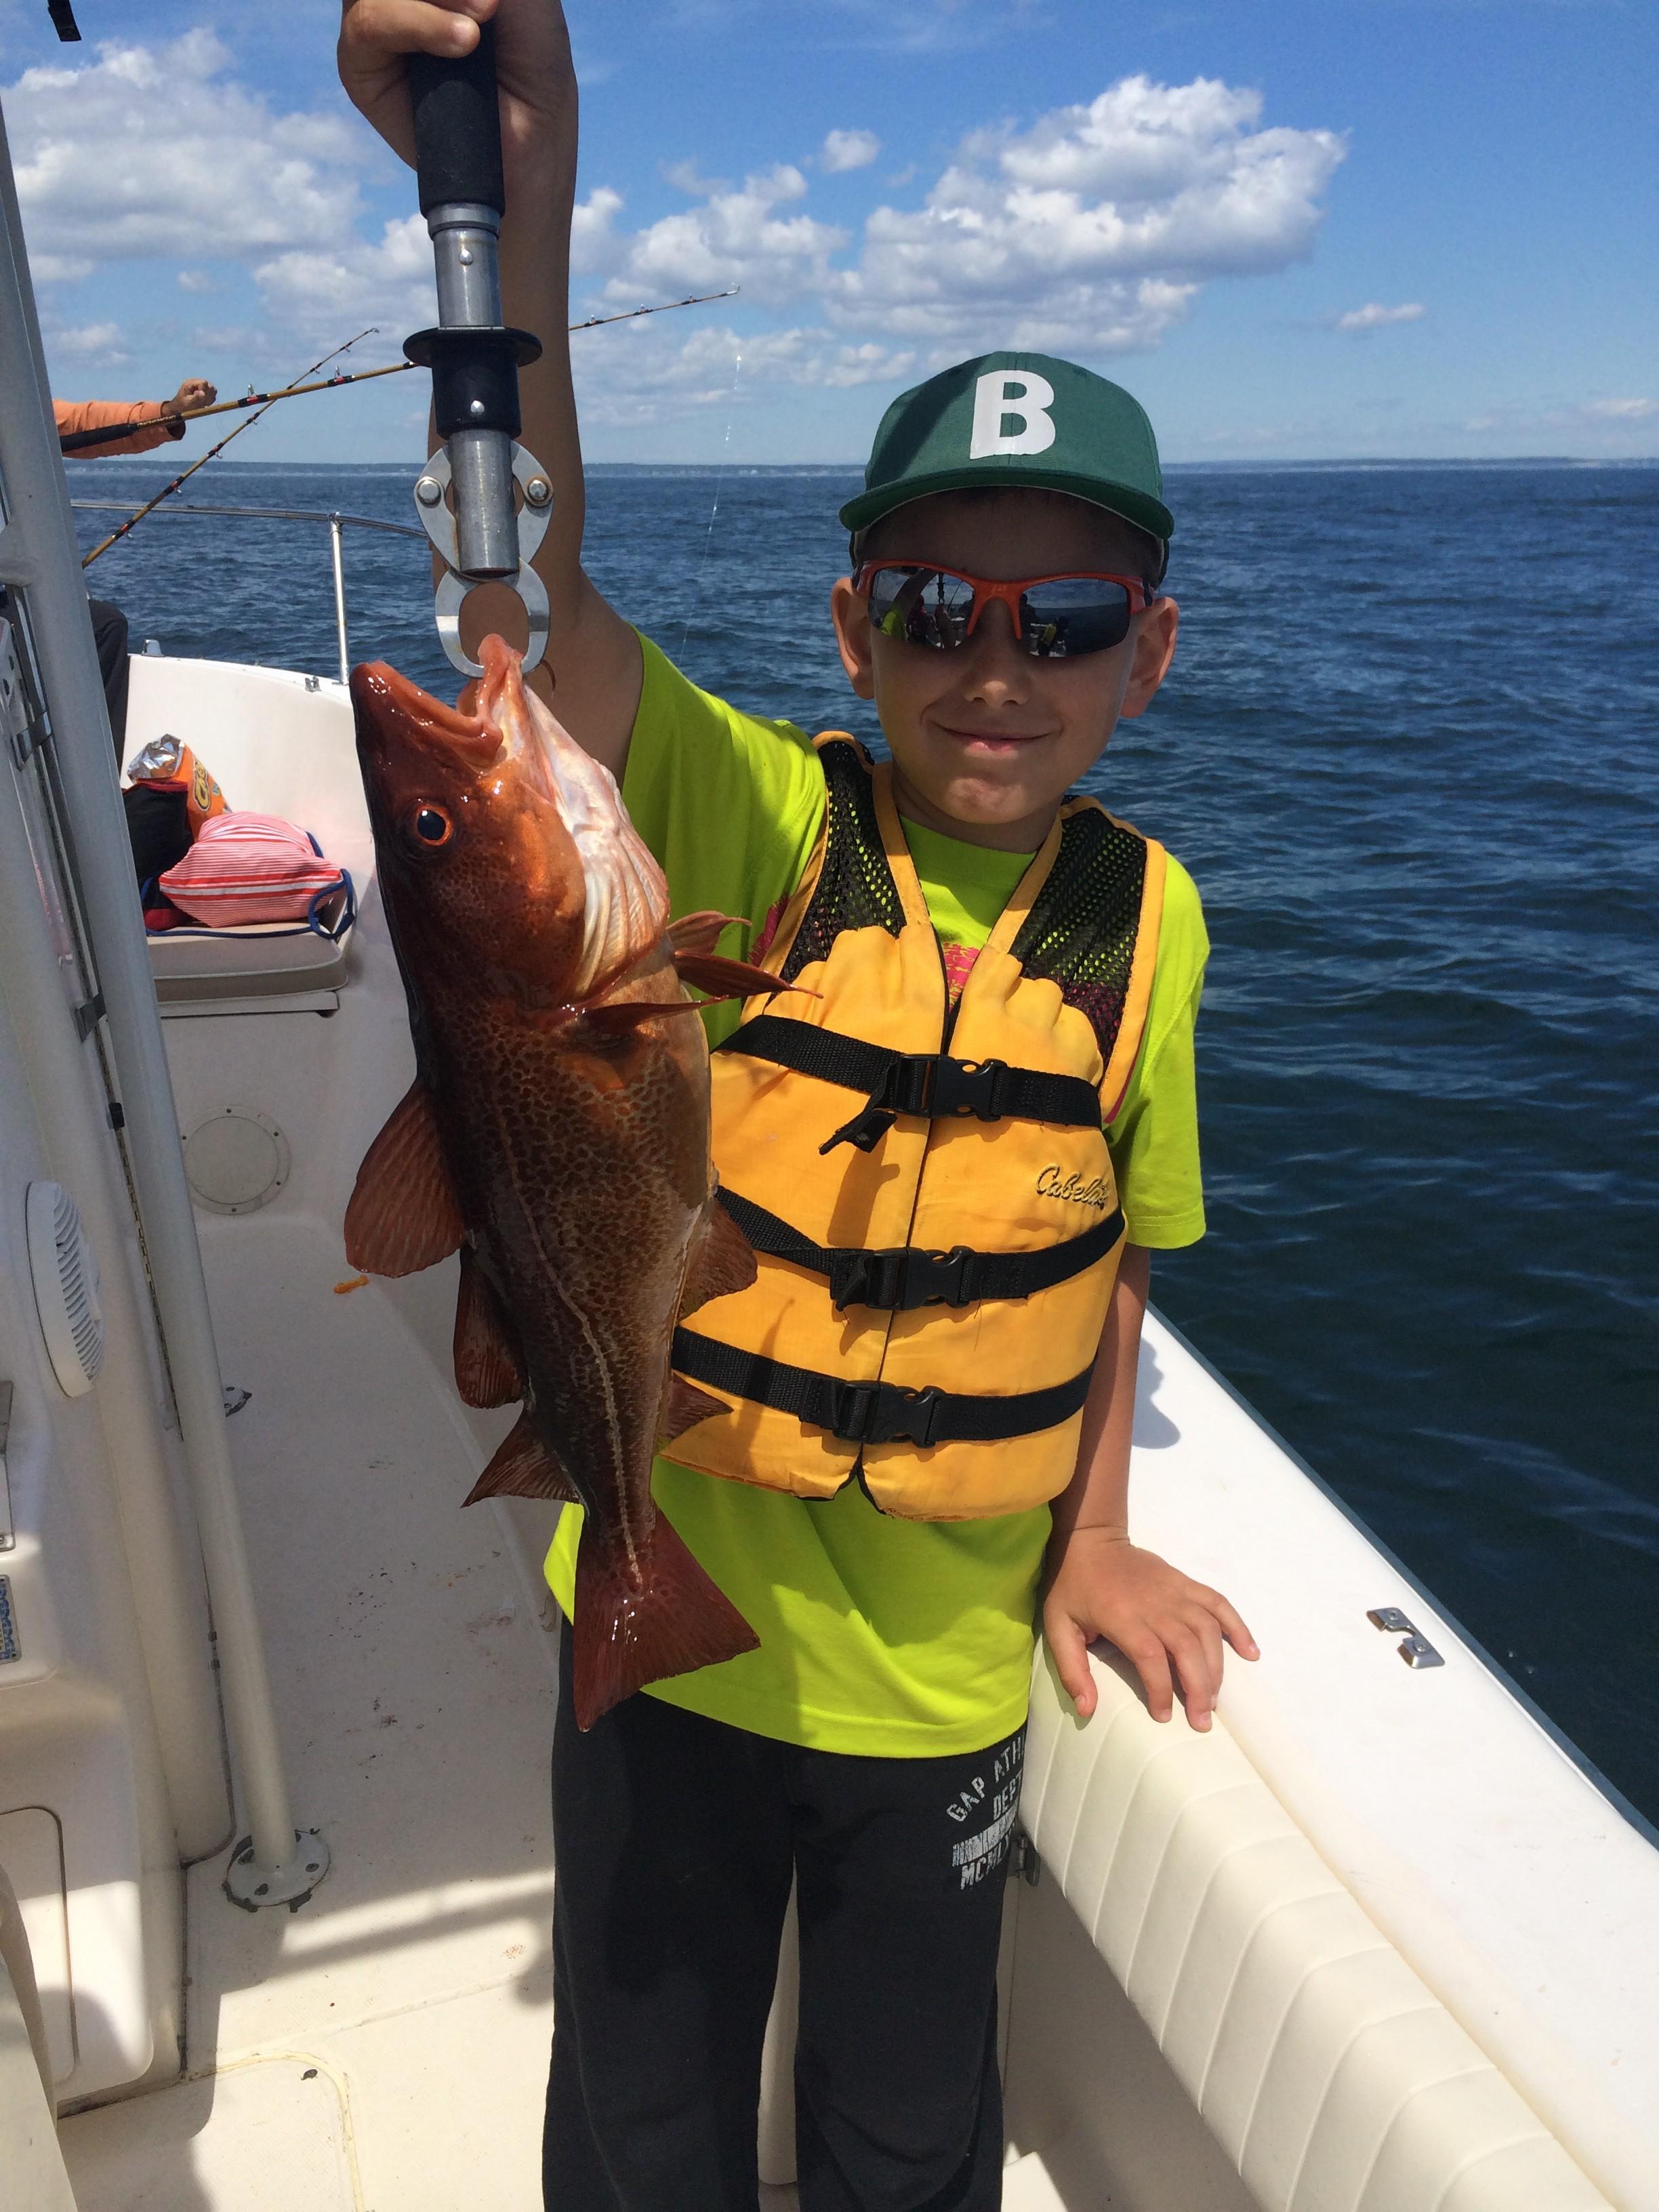 Fish Portland Maine: Family Fun Trip